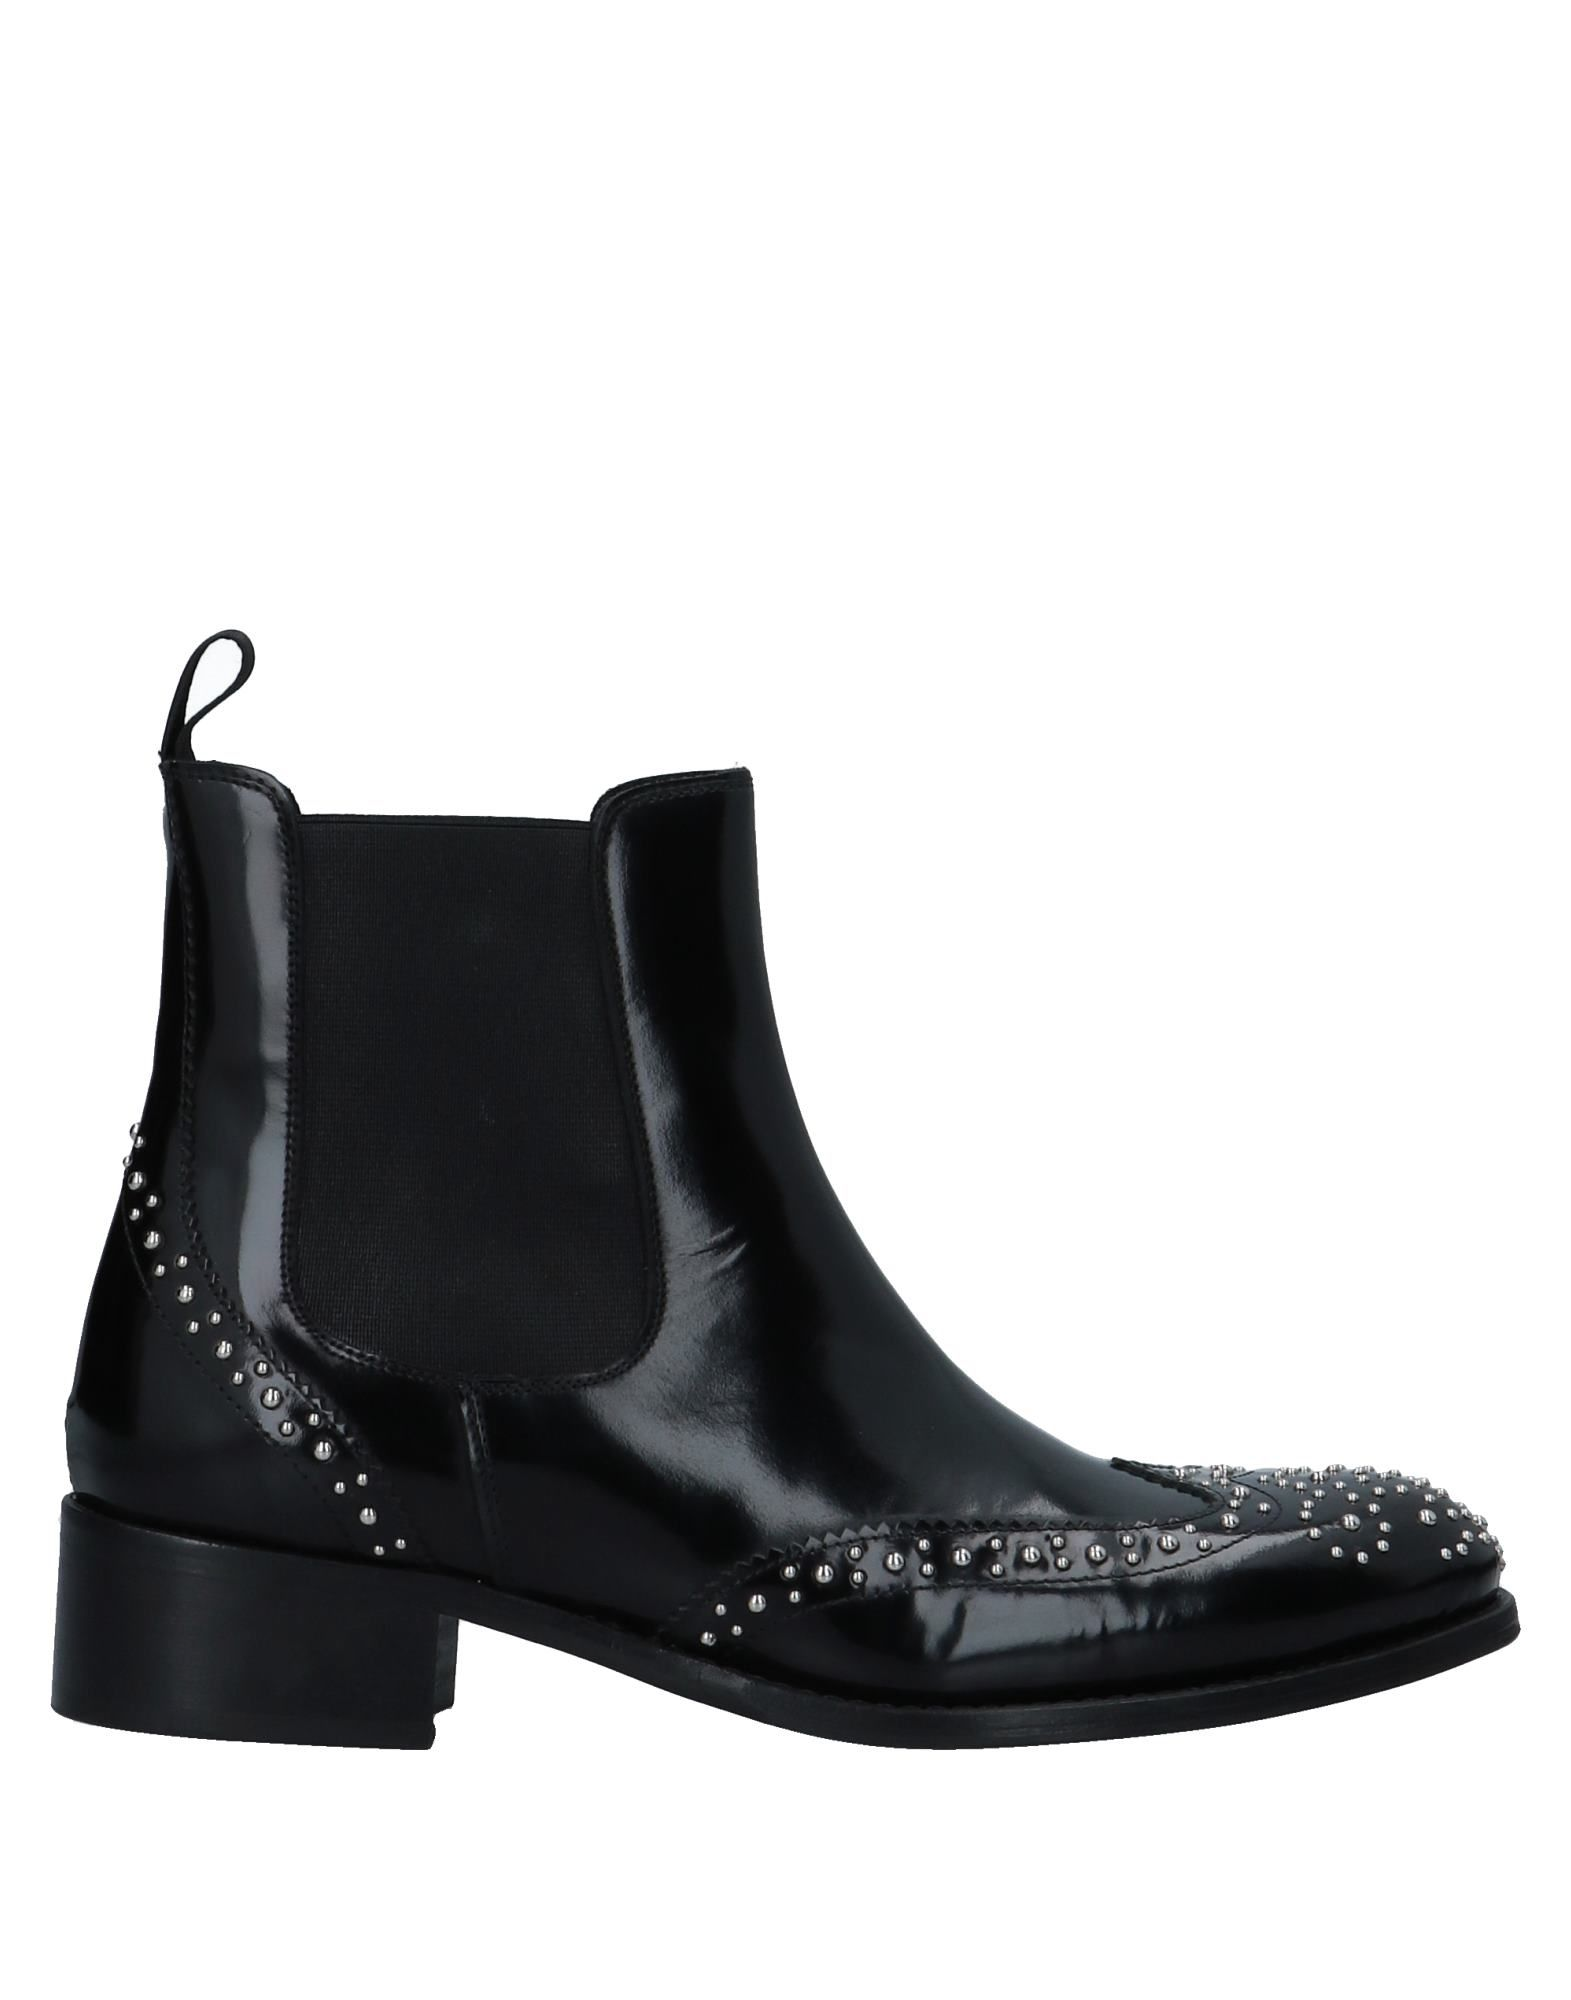 PERTINI Полусапоги и высокие ботинки полусапоги pertini полусапоги